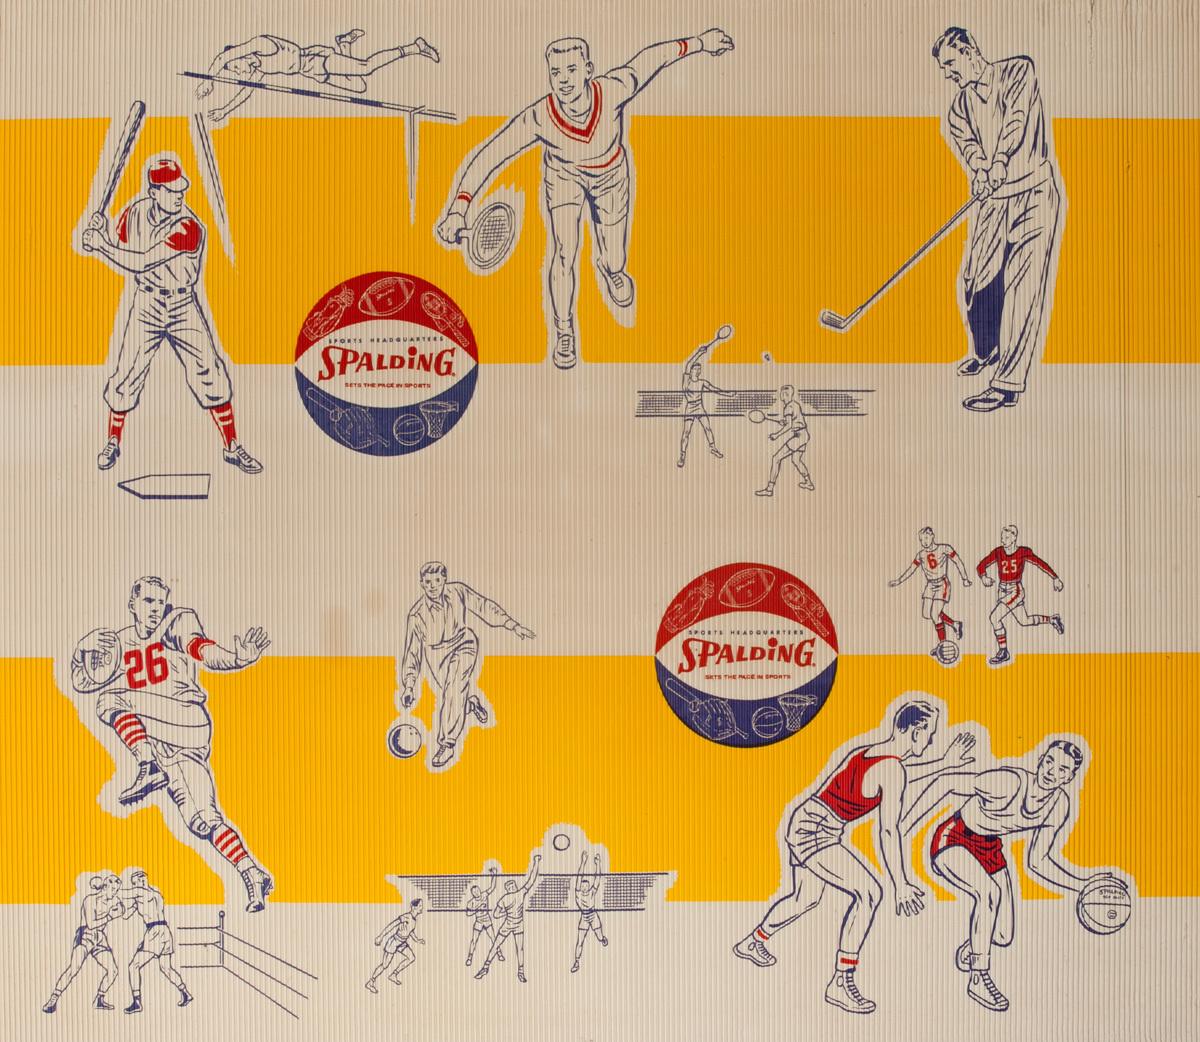 Spaulding Sporting Equipment Original Advertising Poster